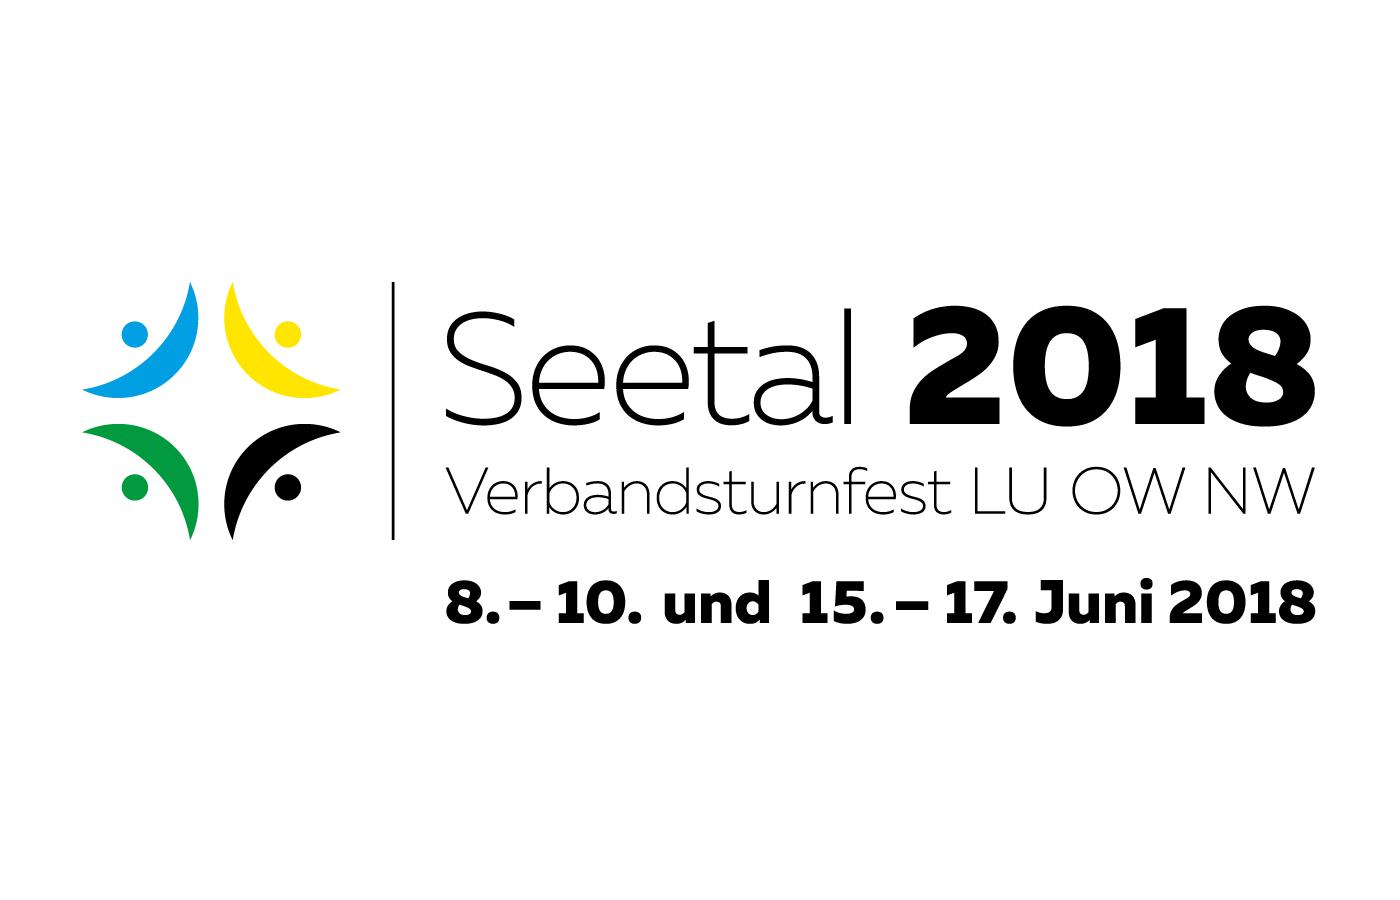 Seetal 2018, Verbandsturnfest LU OW NW